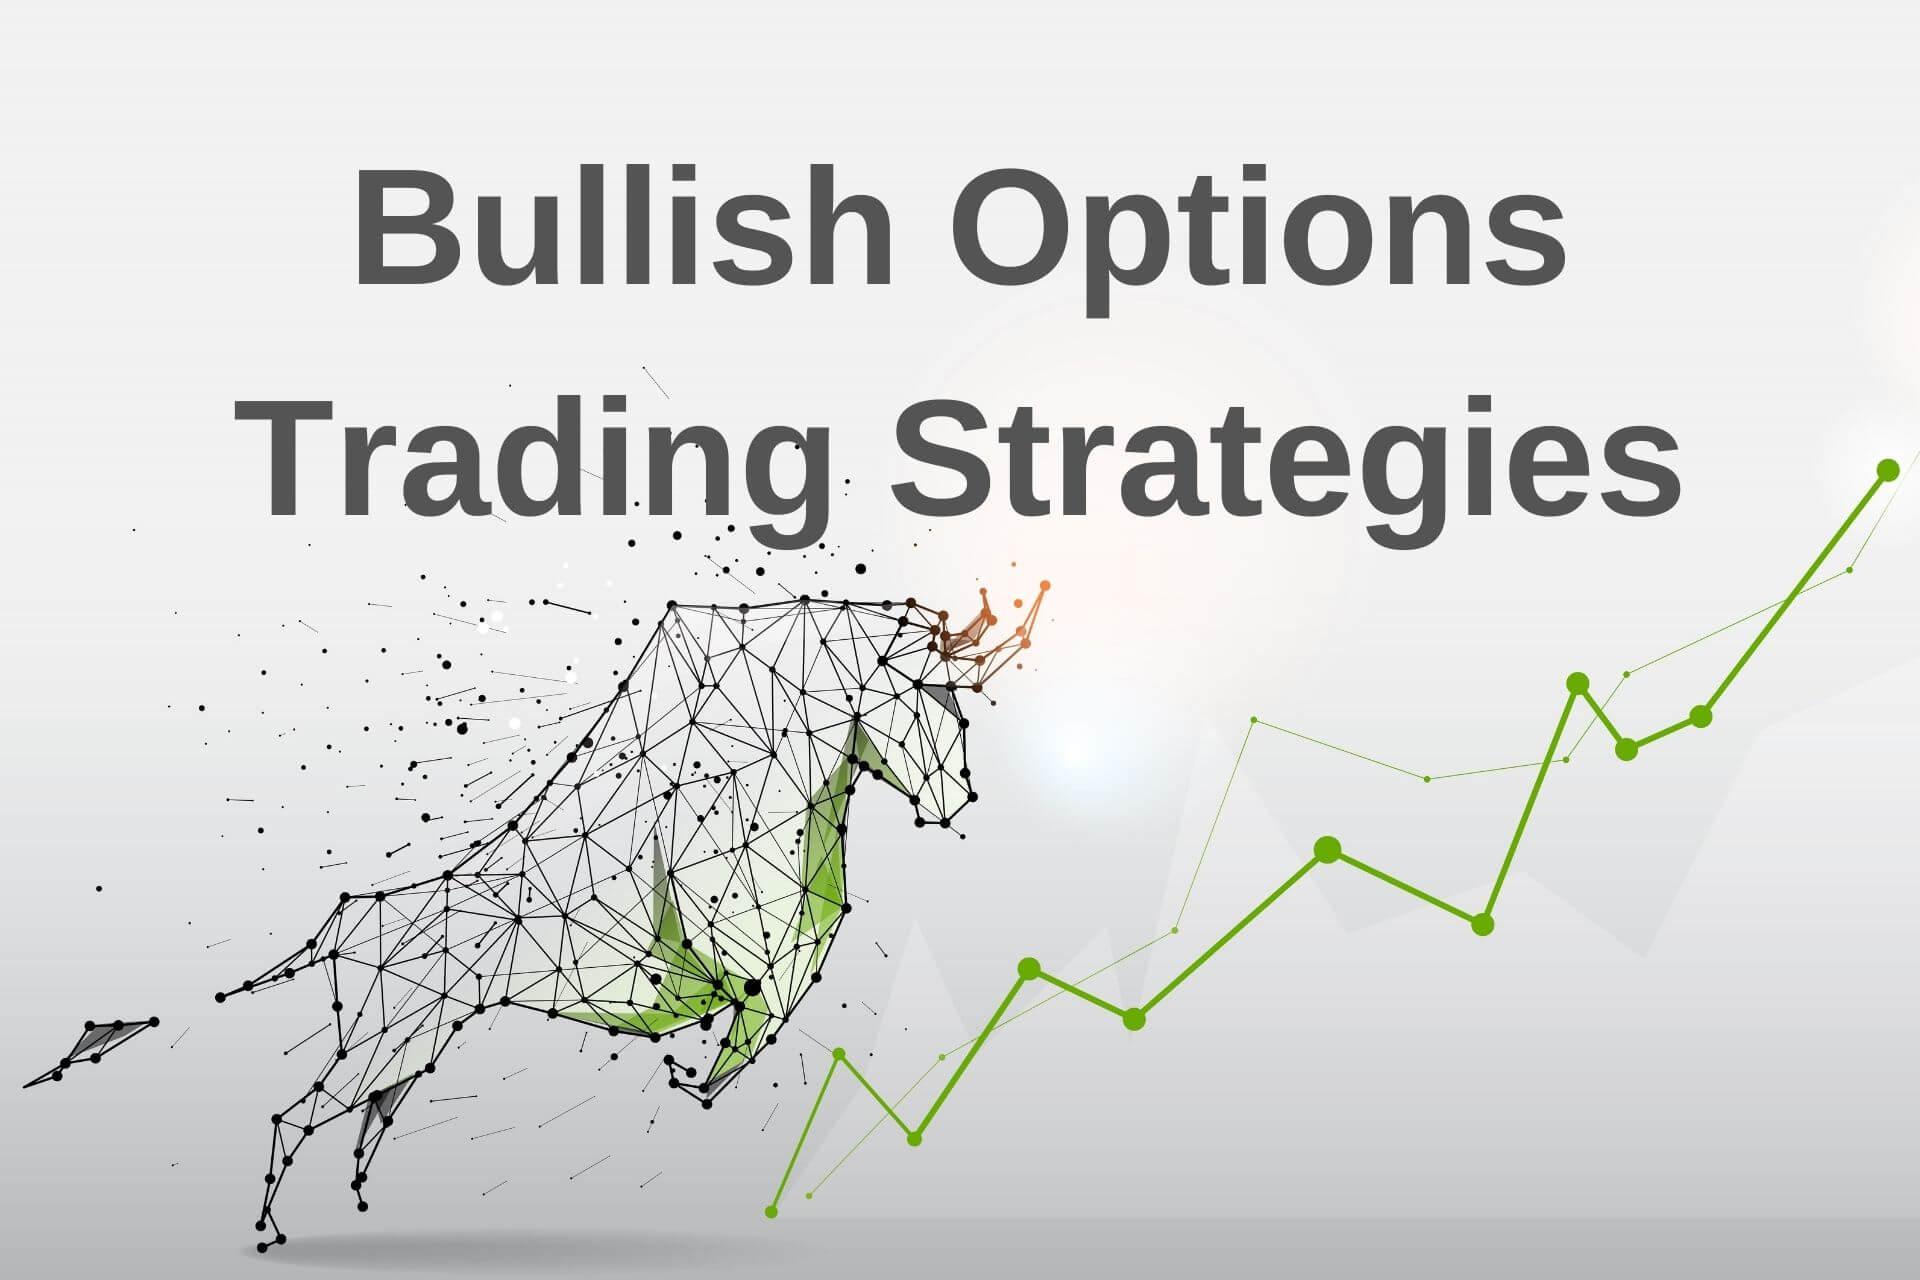 Bullish Options Trading Strategies – How to Use Options in Bullish Market?